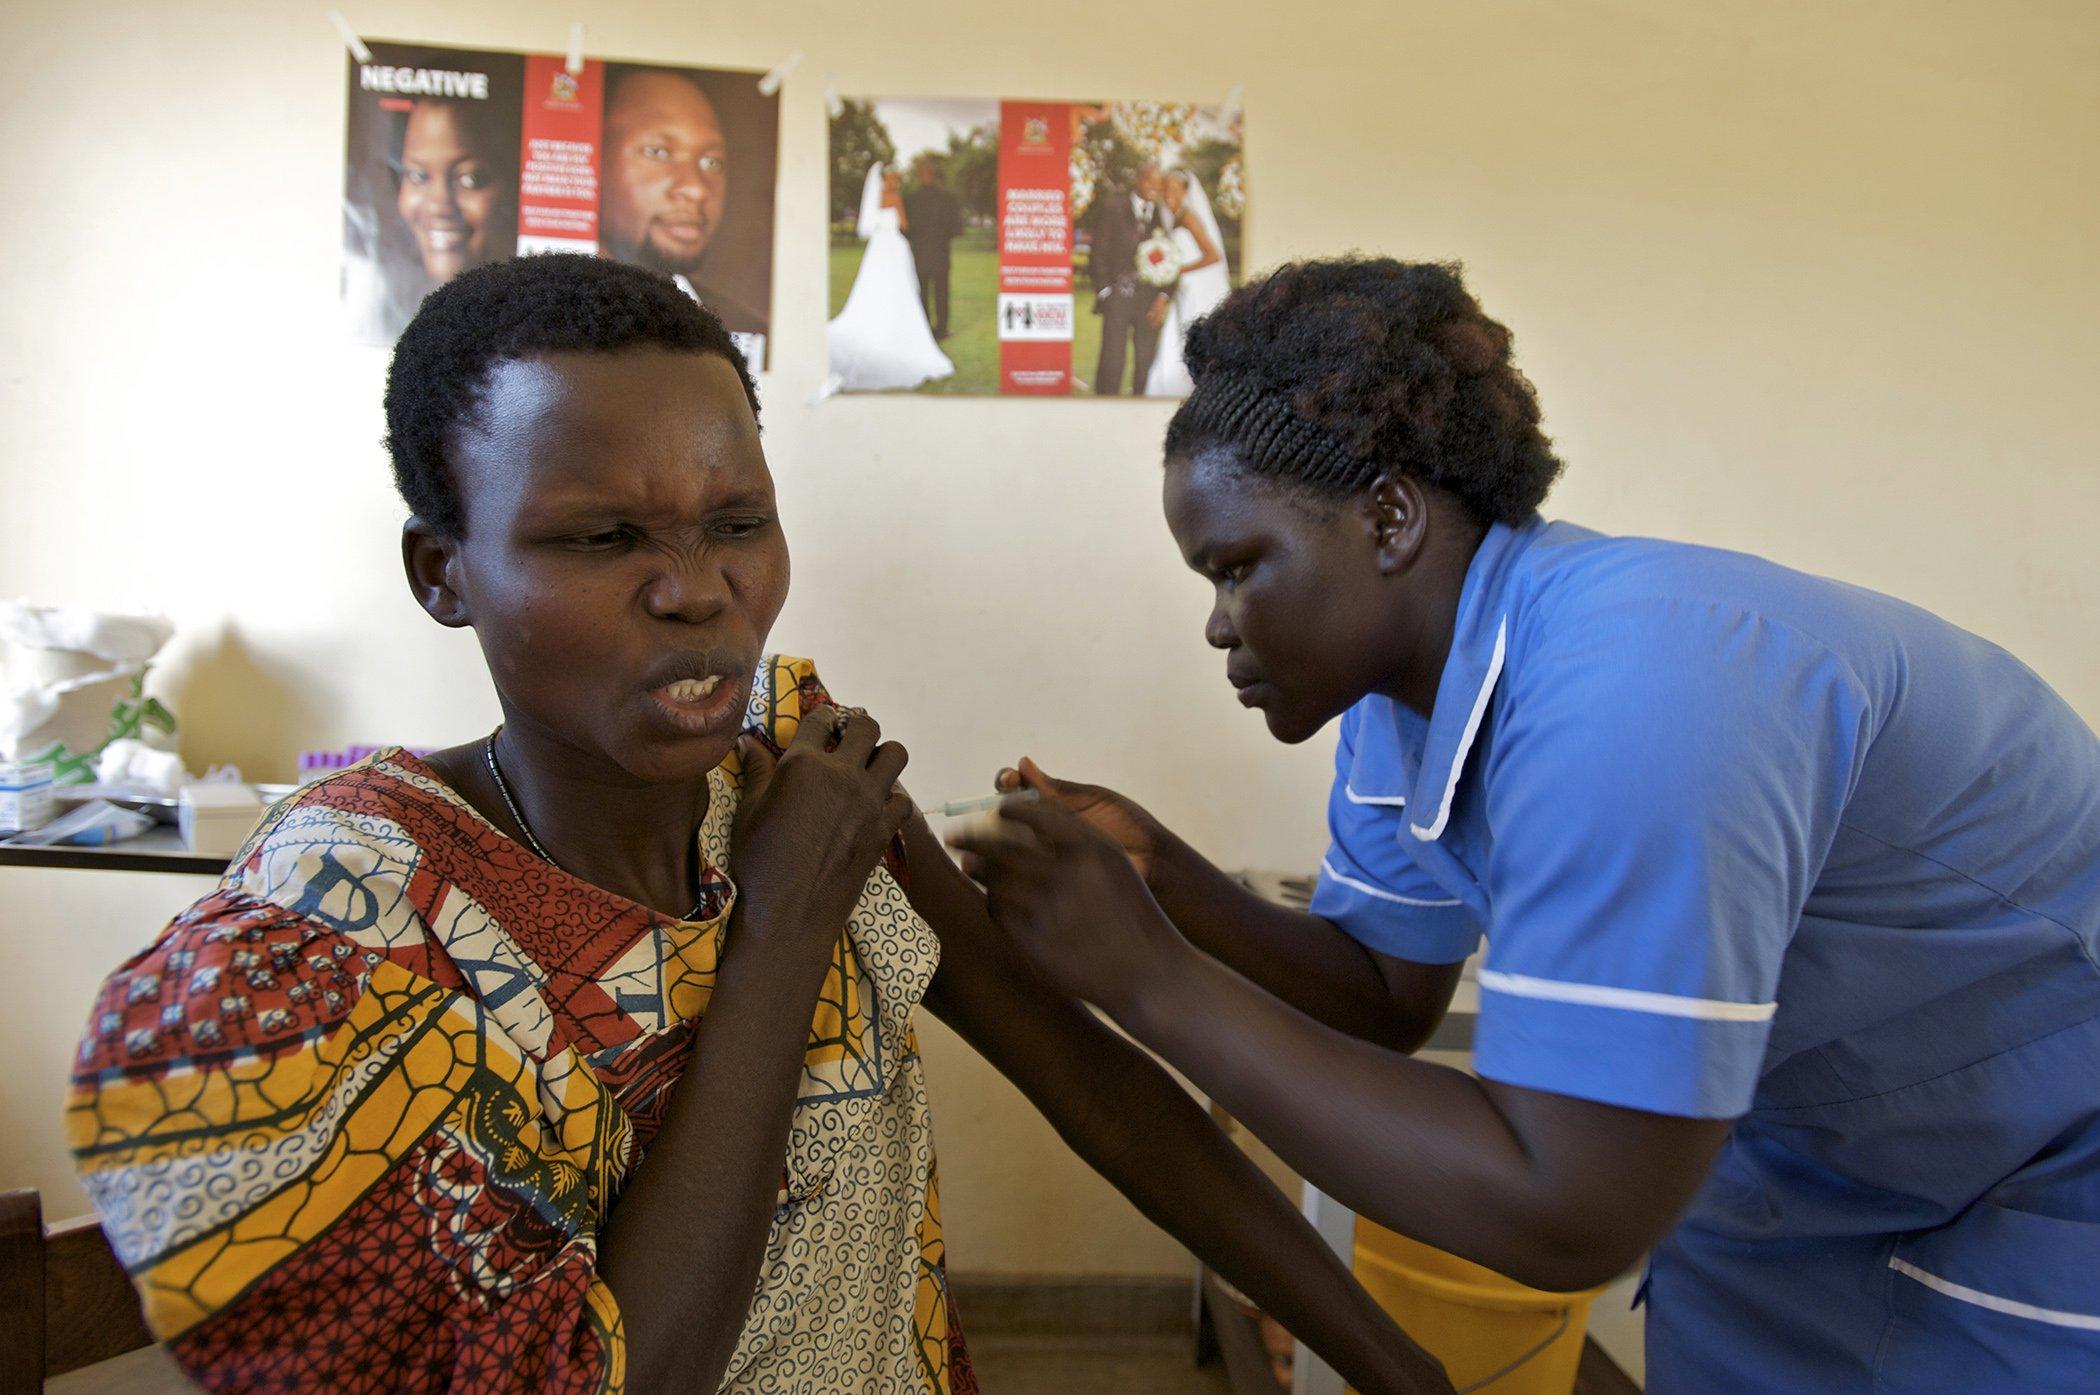 UNICEF_Vaccinations-Around-The-World_006.JPG